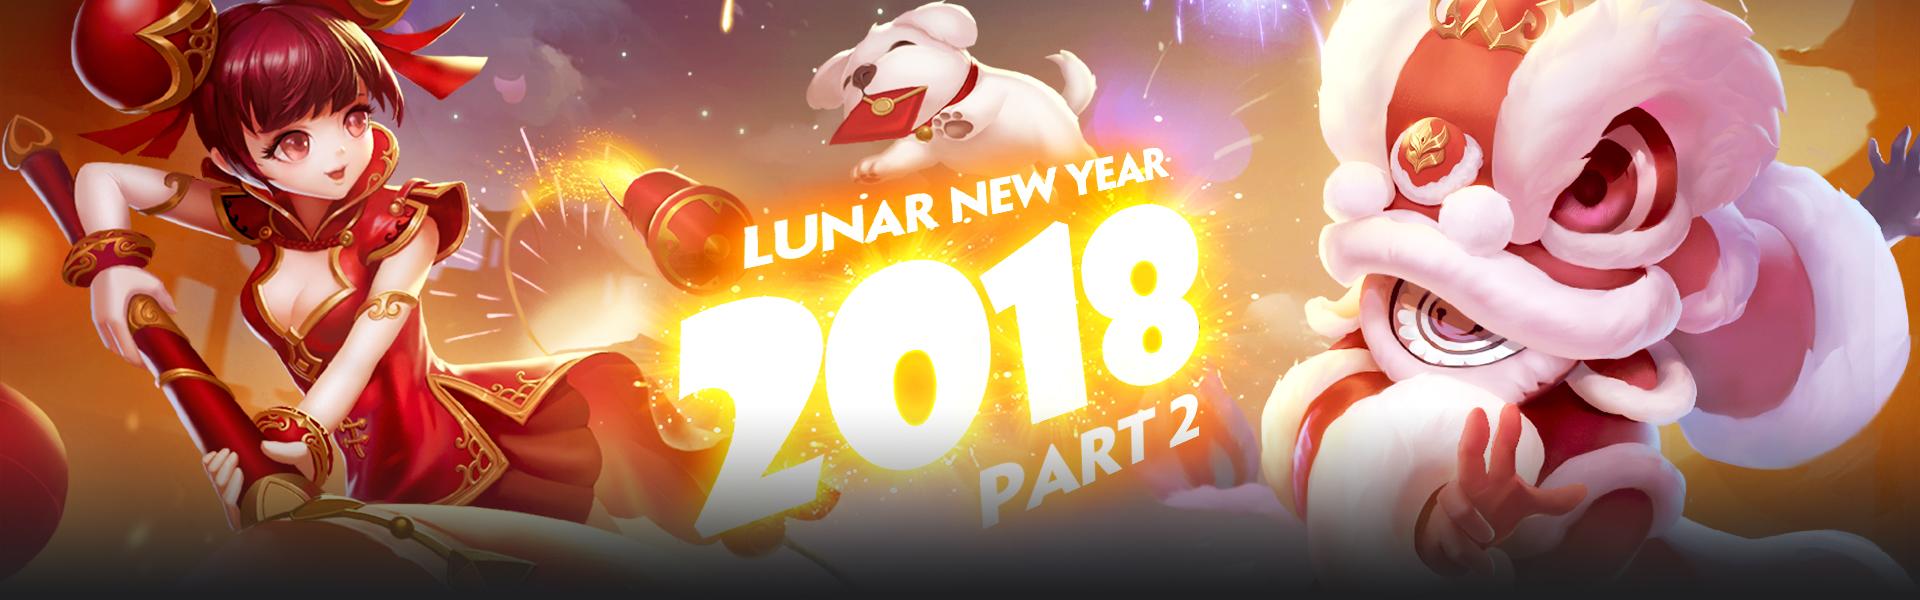 LUNAR NEW YEAR SPECIALS II